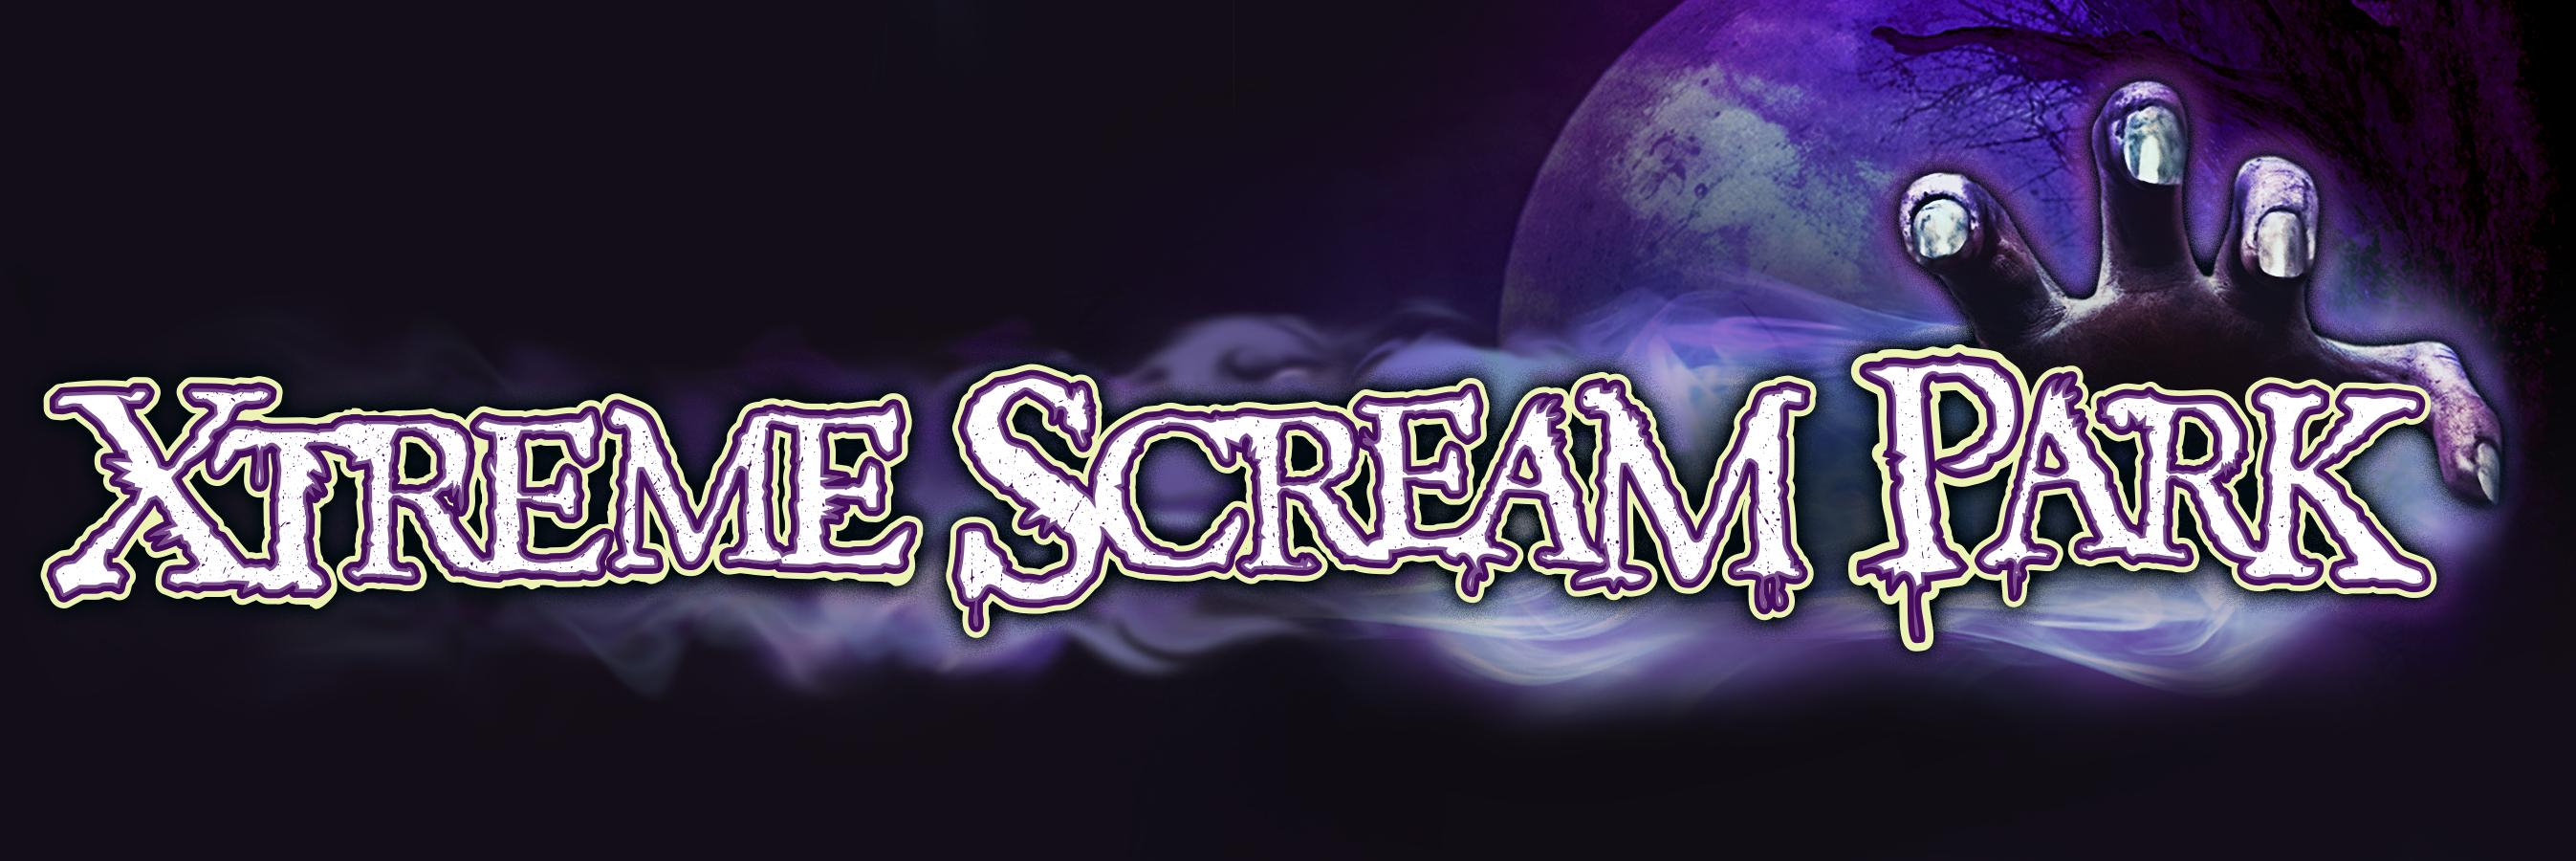 Xtreme Scream 2017